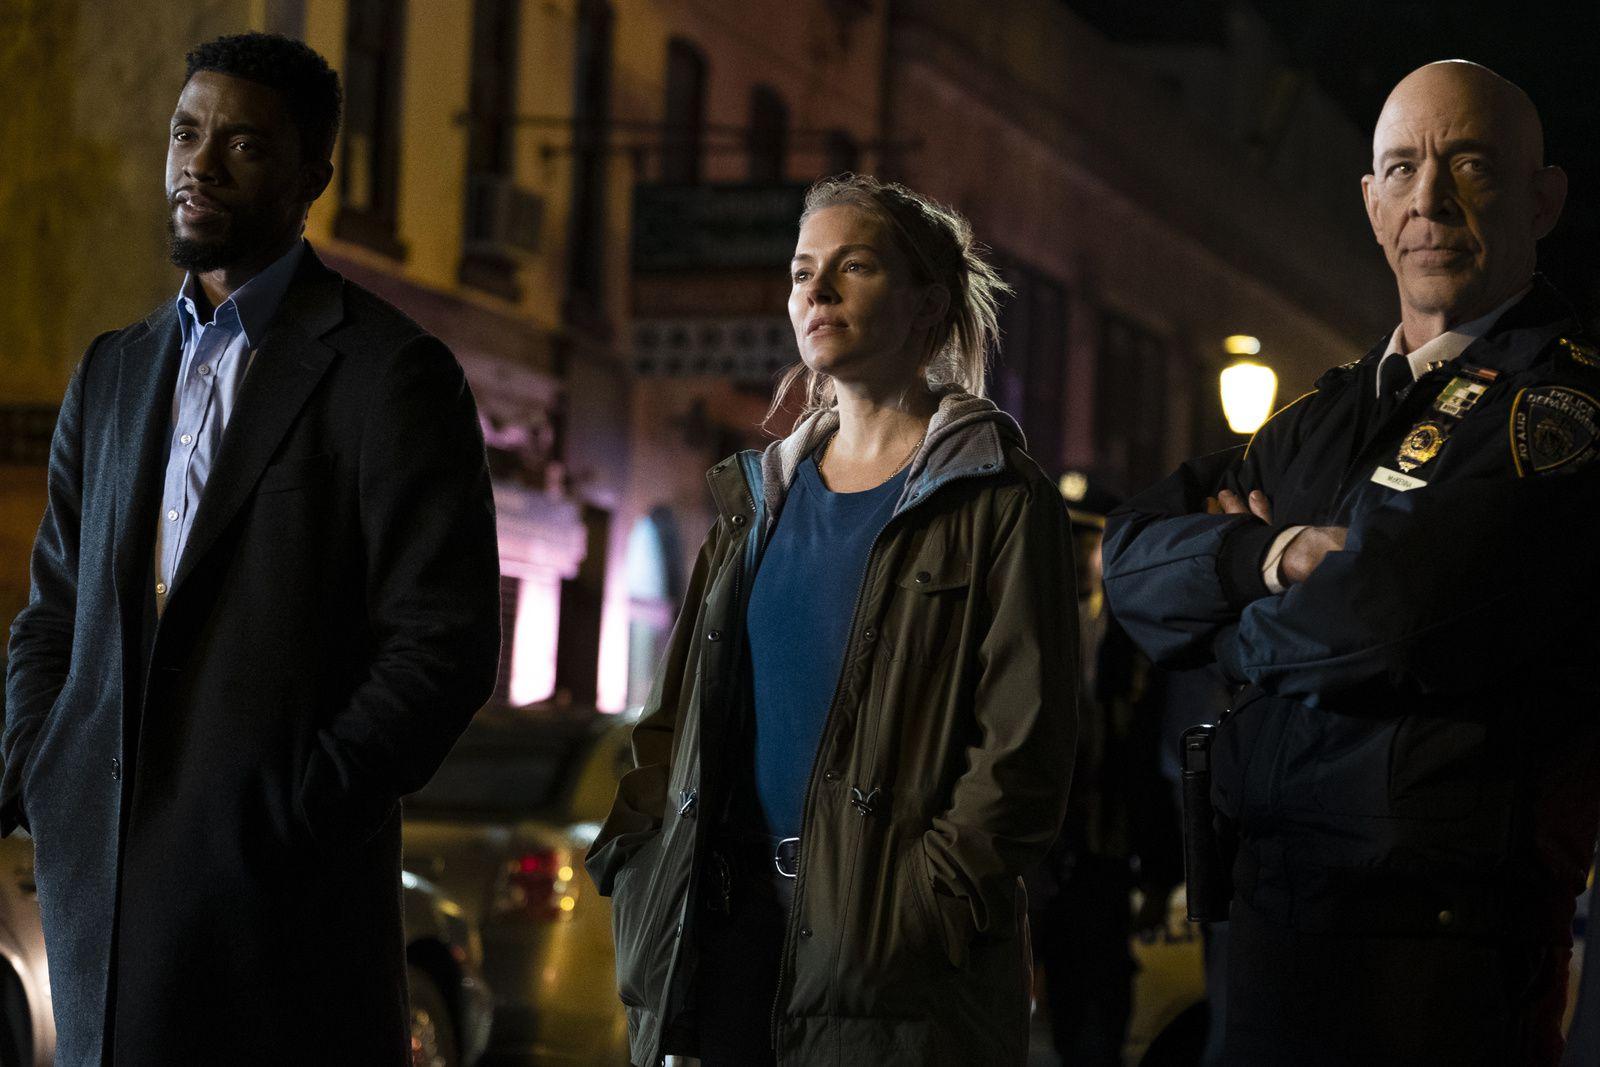 Manhattan Lockdown (BANDE-ANNONCE) avec Sienna Miller, Chadwick Boseman, J.K. Simmons - Le 1er janvier 2020 au cinéma